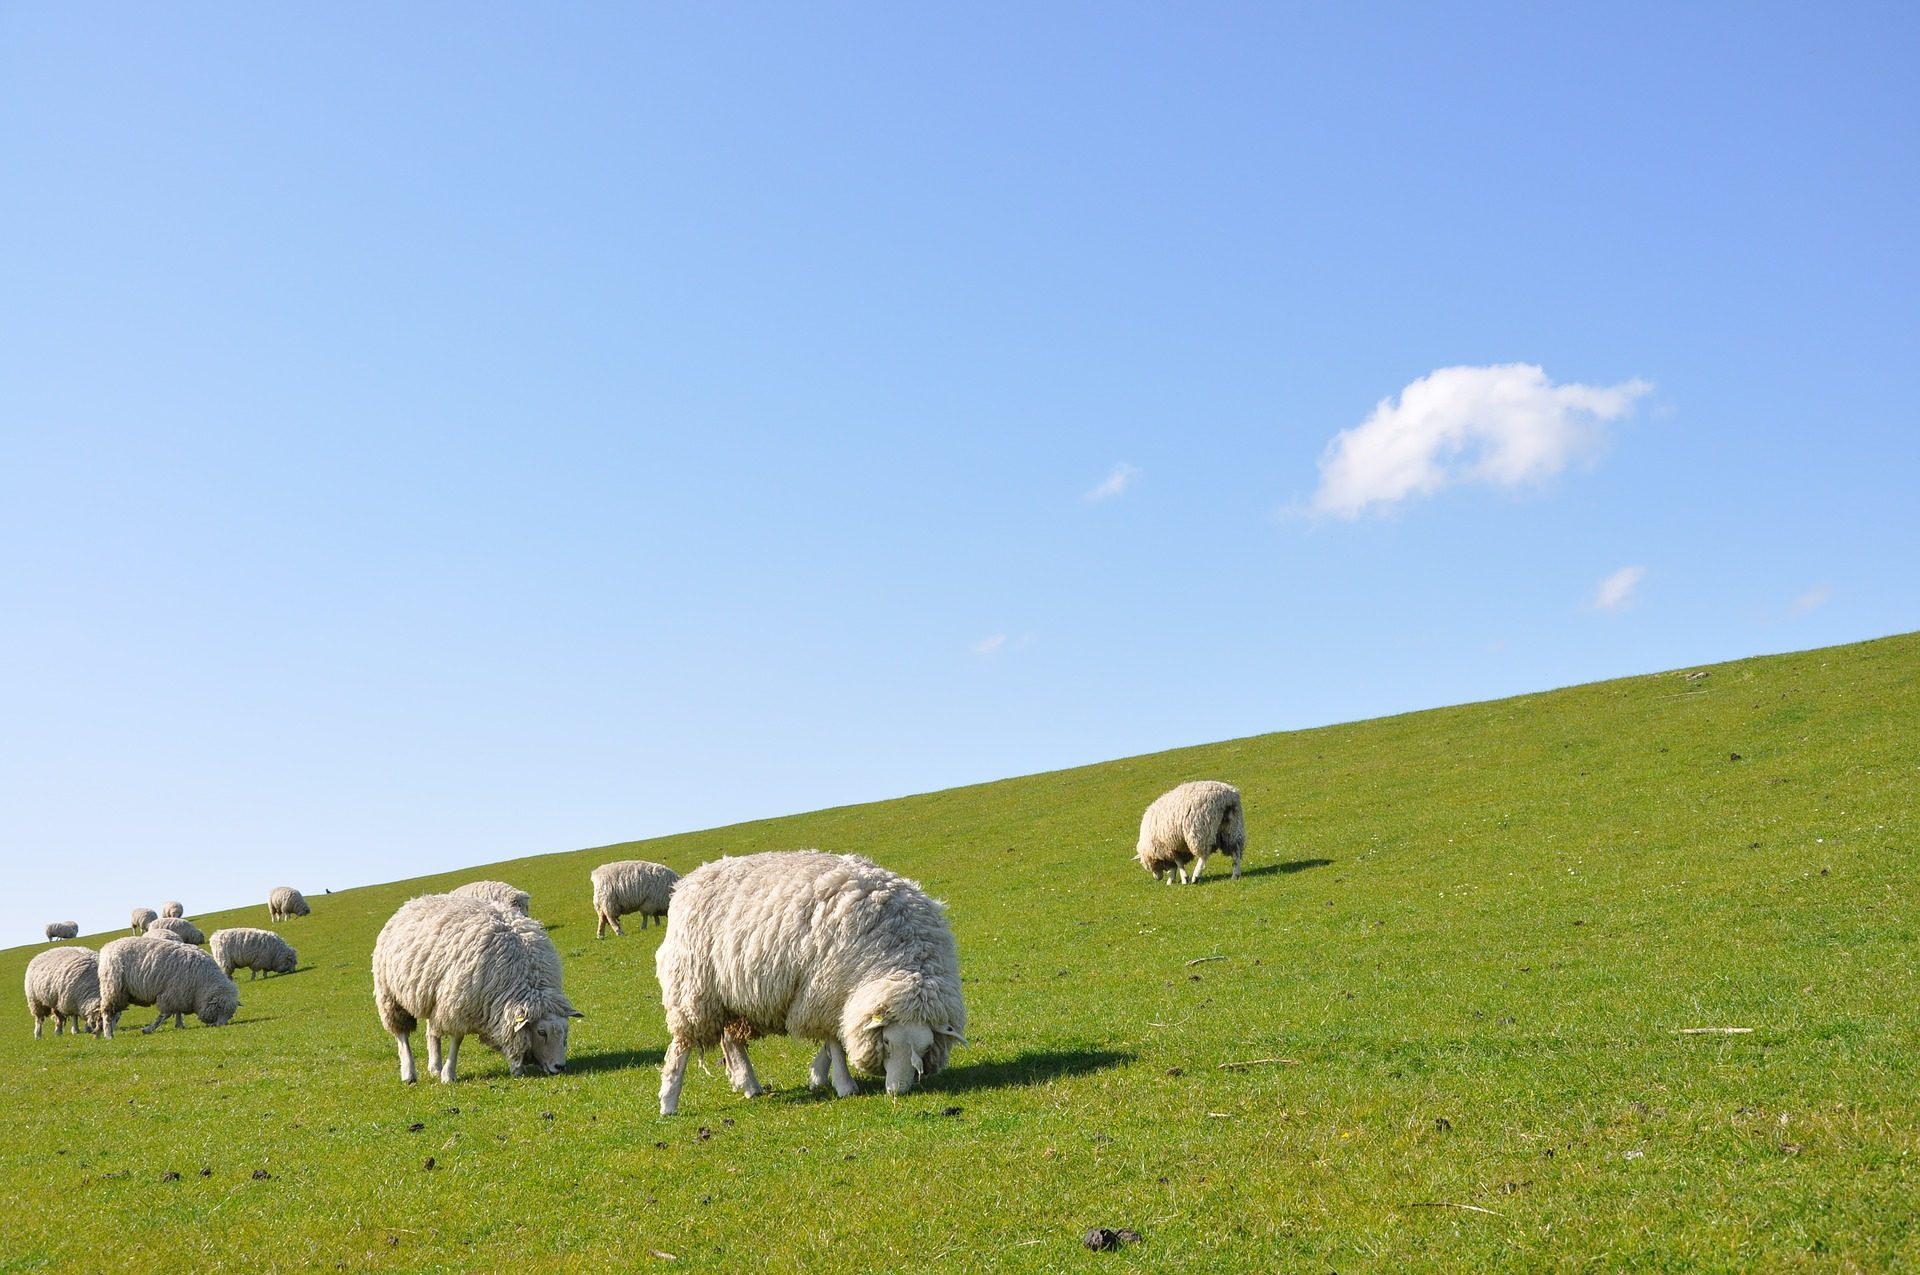 ovejas, lana, pradera, pastando, cielo - Fondos de Pantalla HD - professor-falken.com